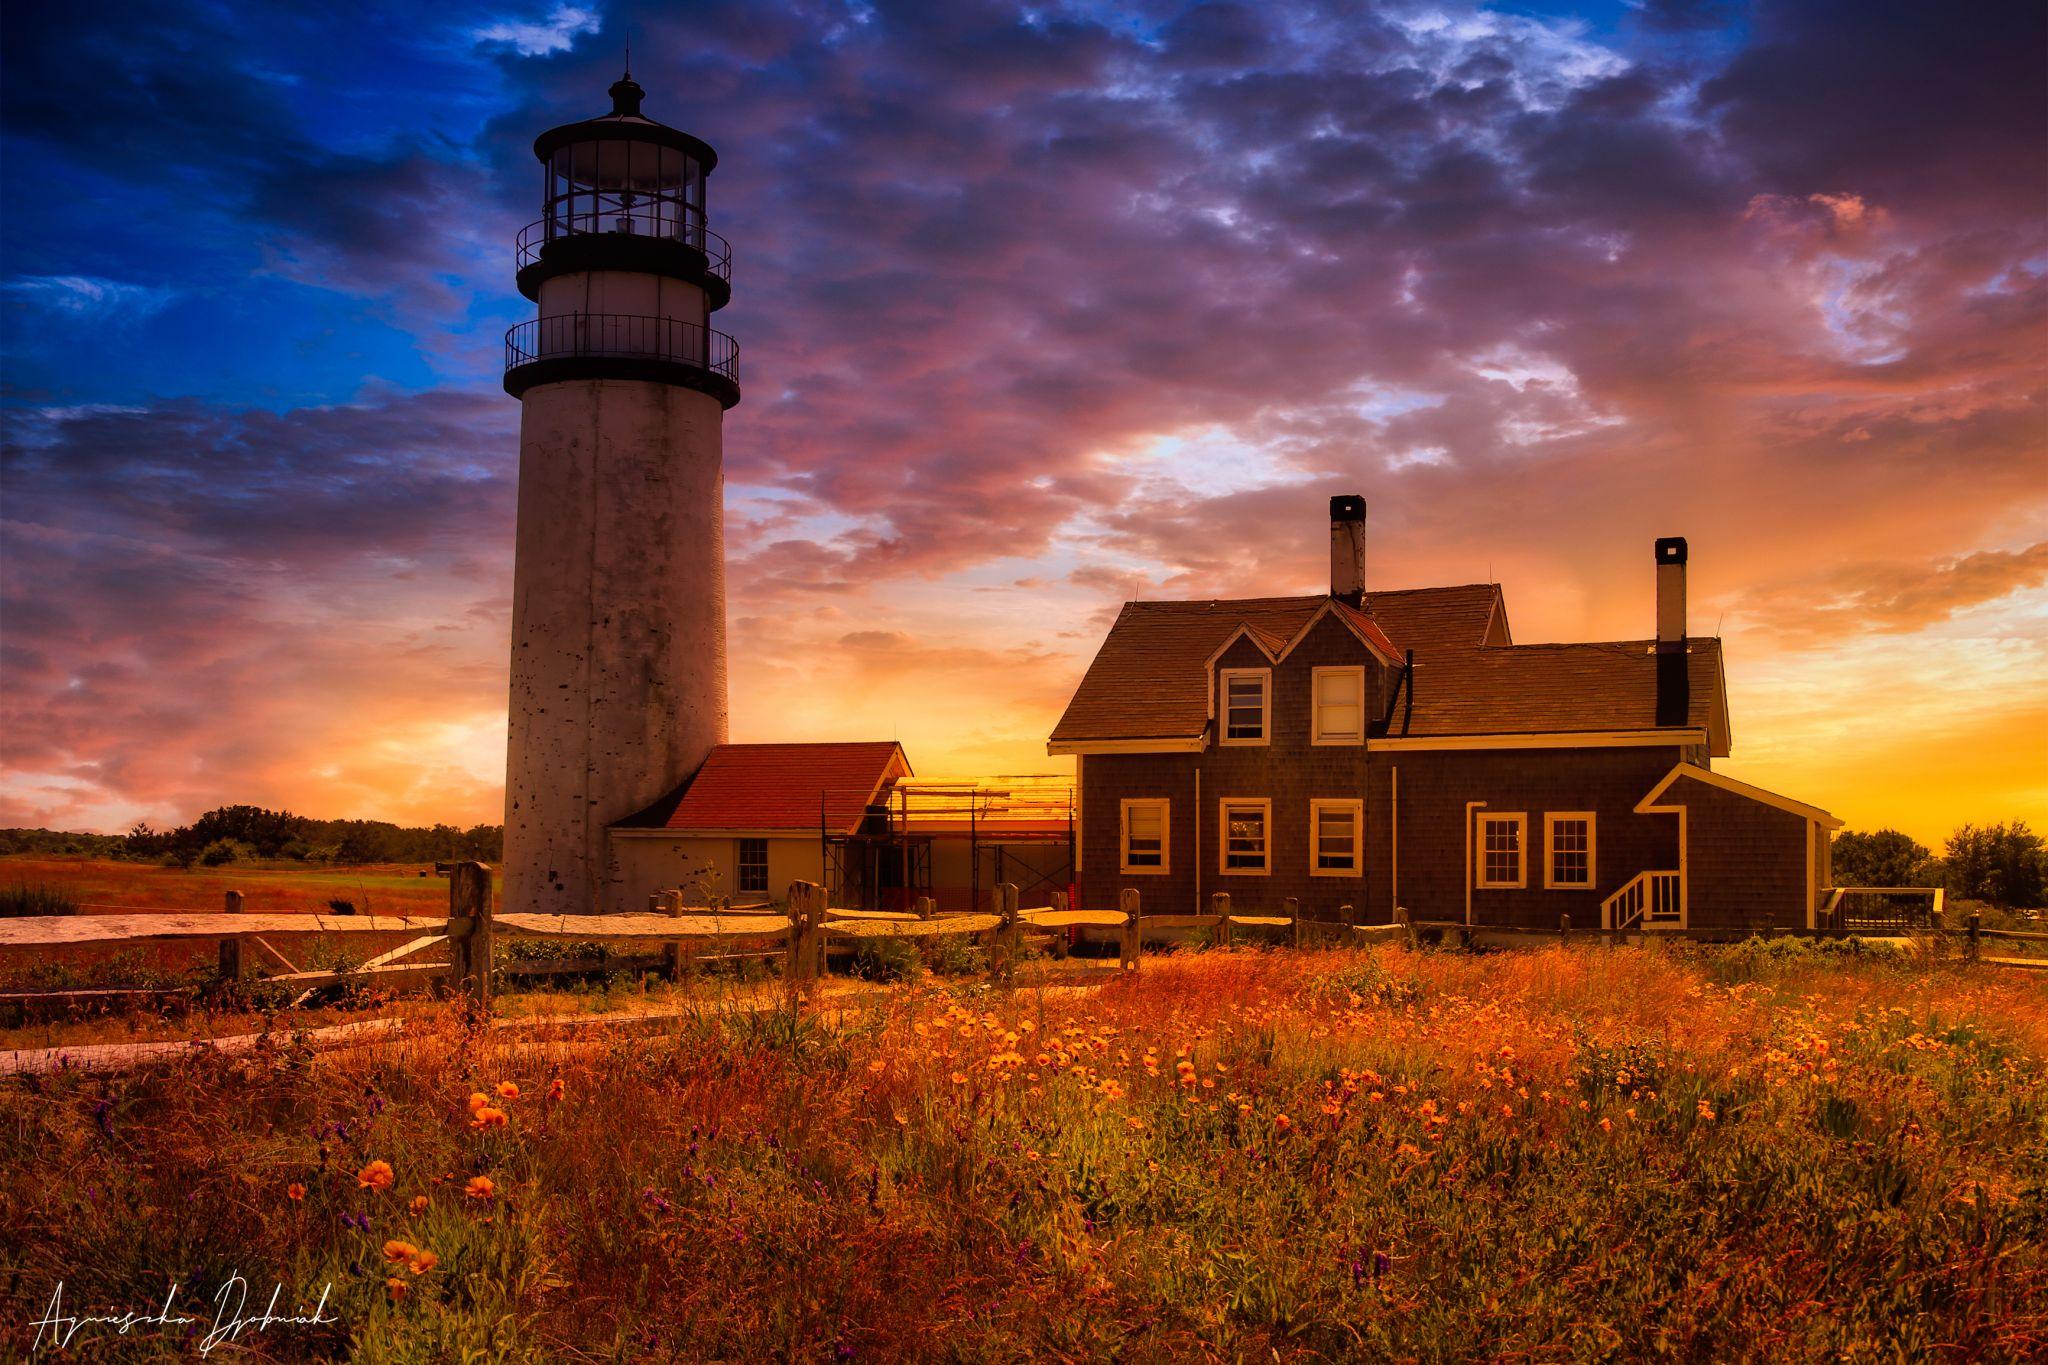 Highland Lighthouse, Cape Cod, USA, USA